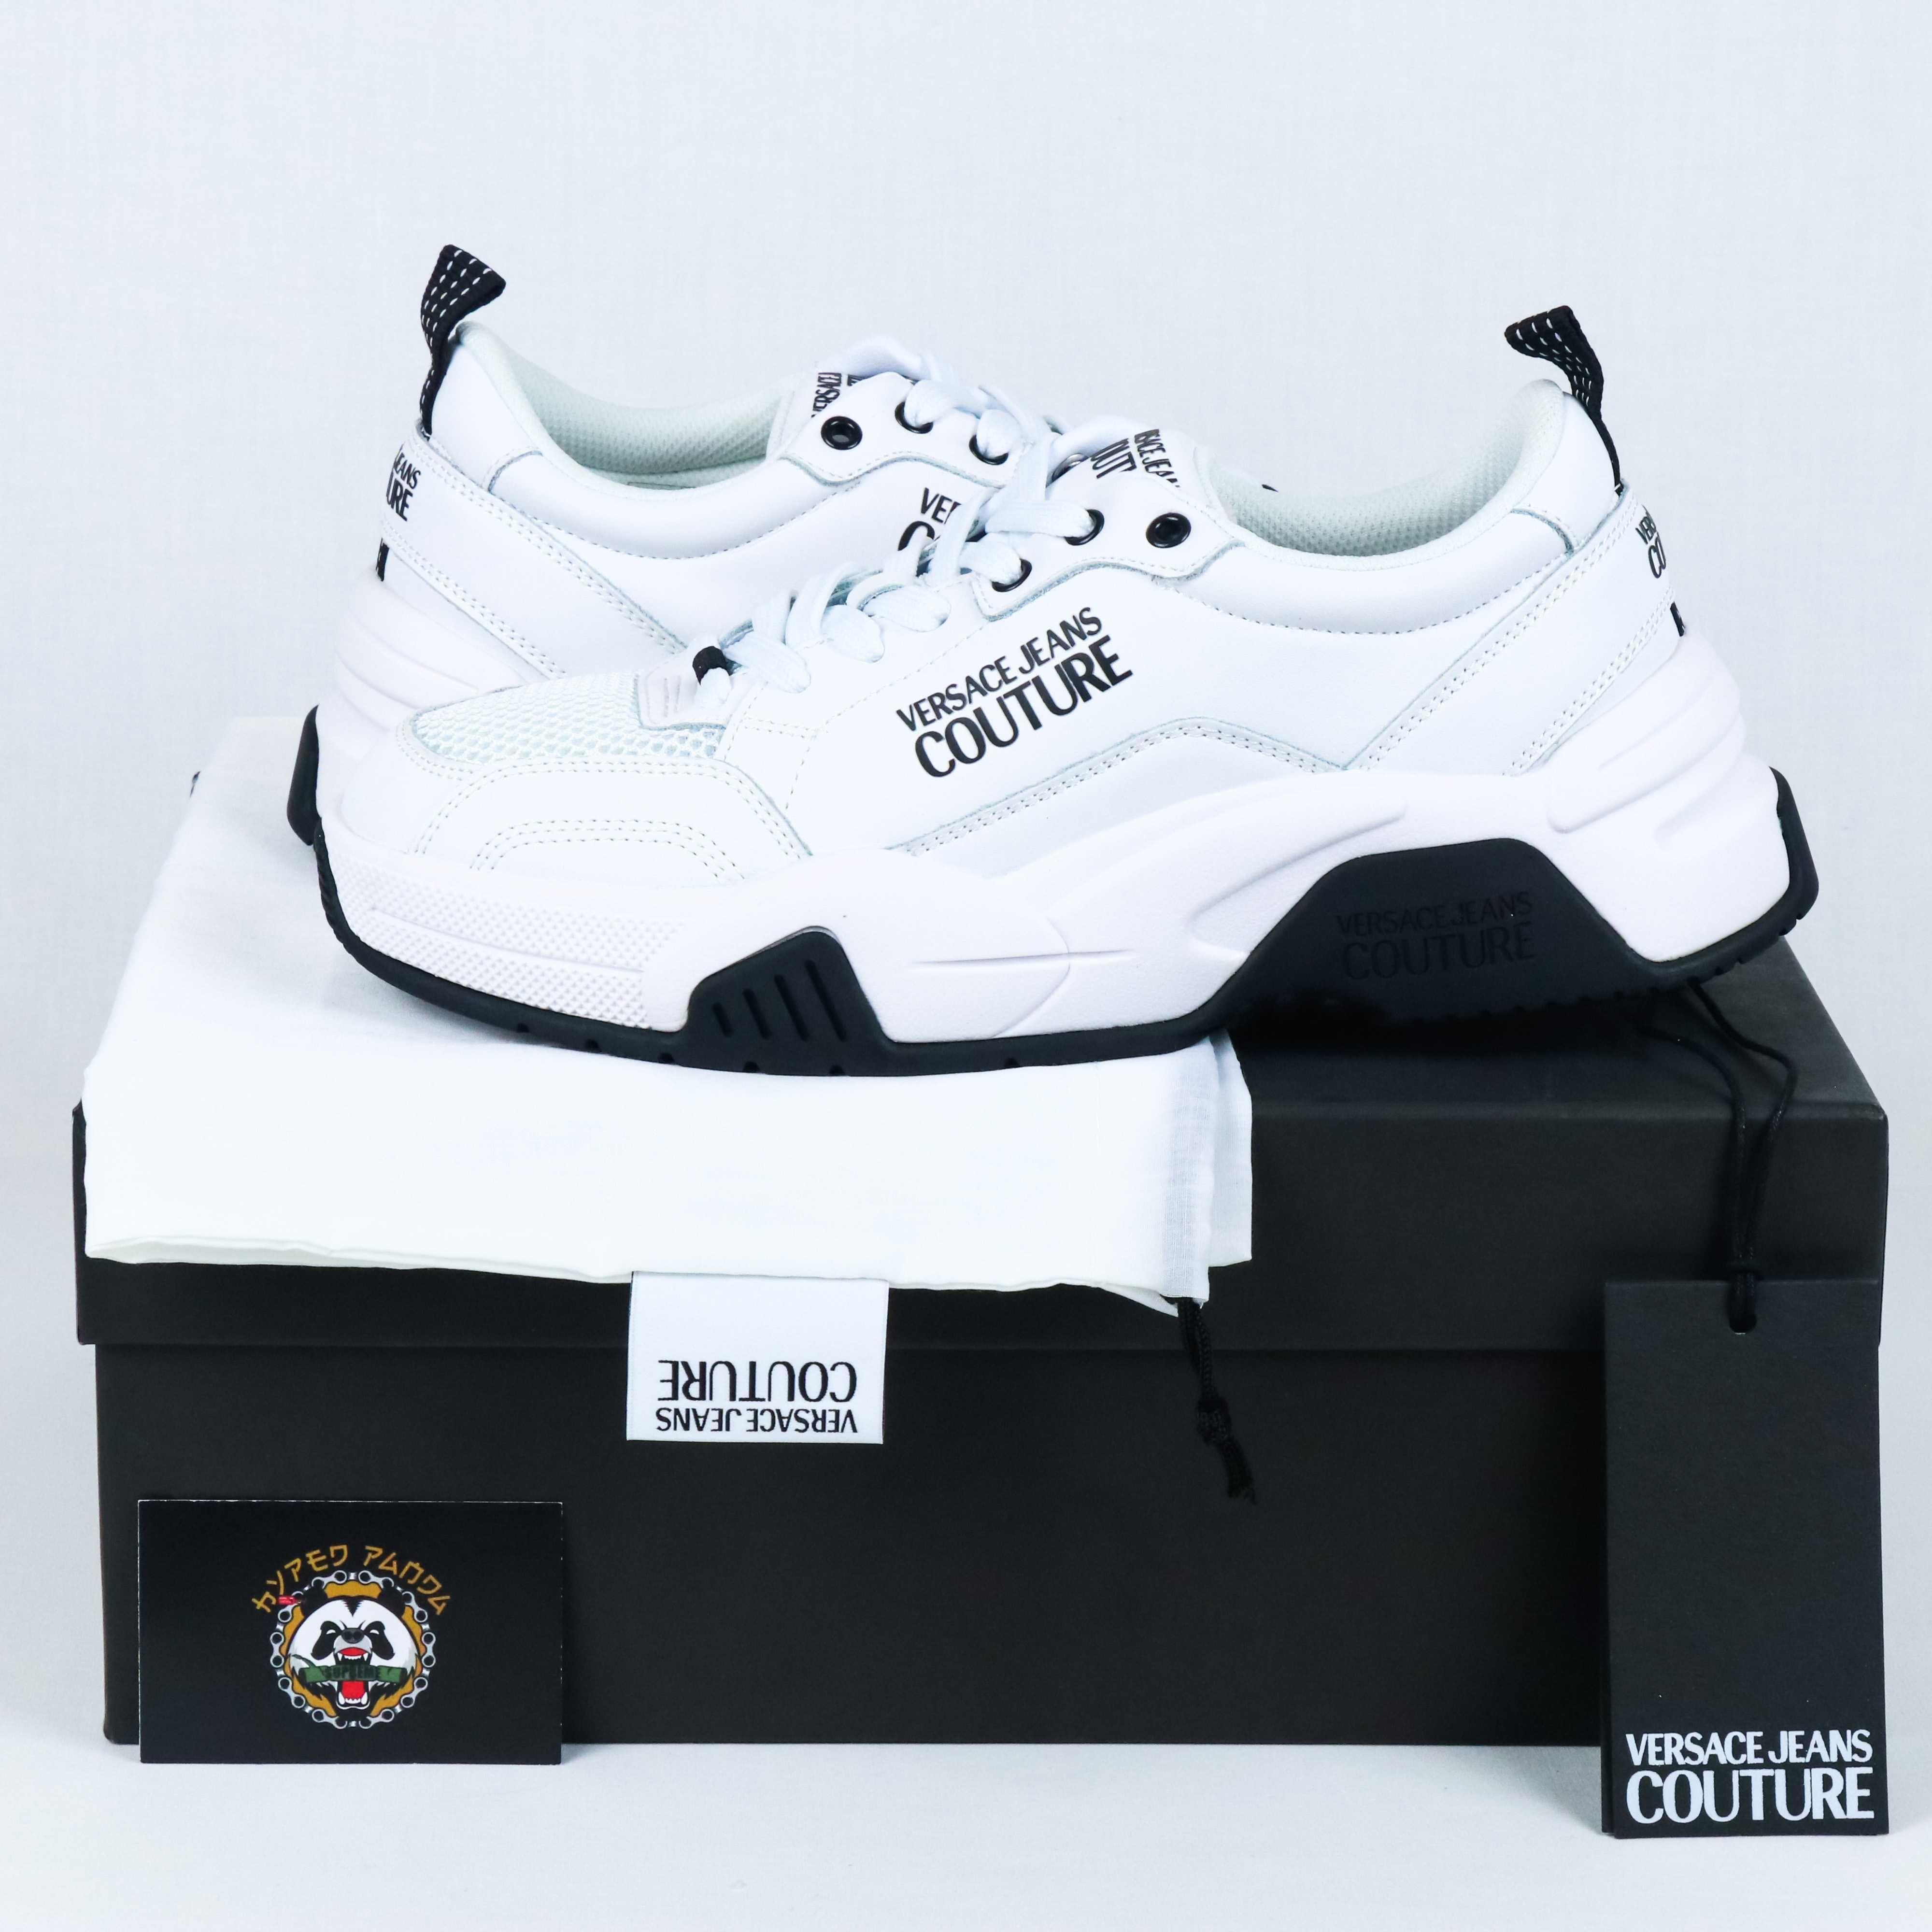 VERSACE Jeans Couture - White Linea Fondo - 42